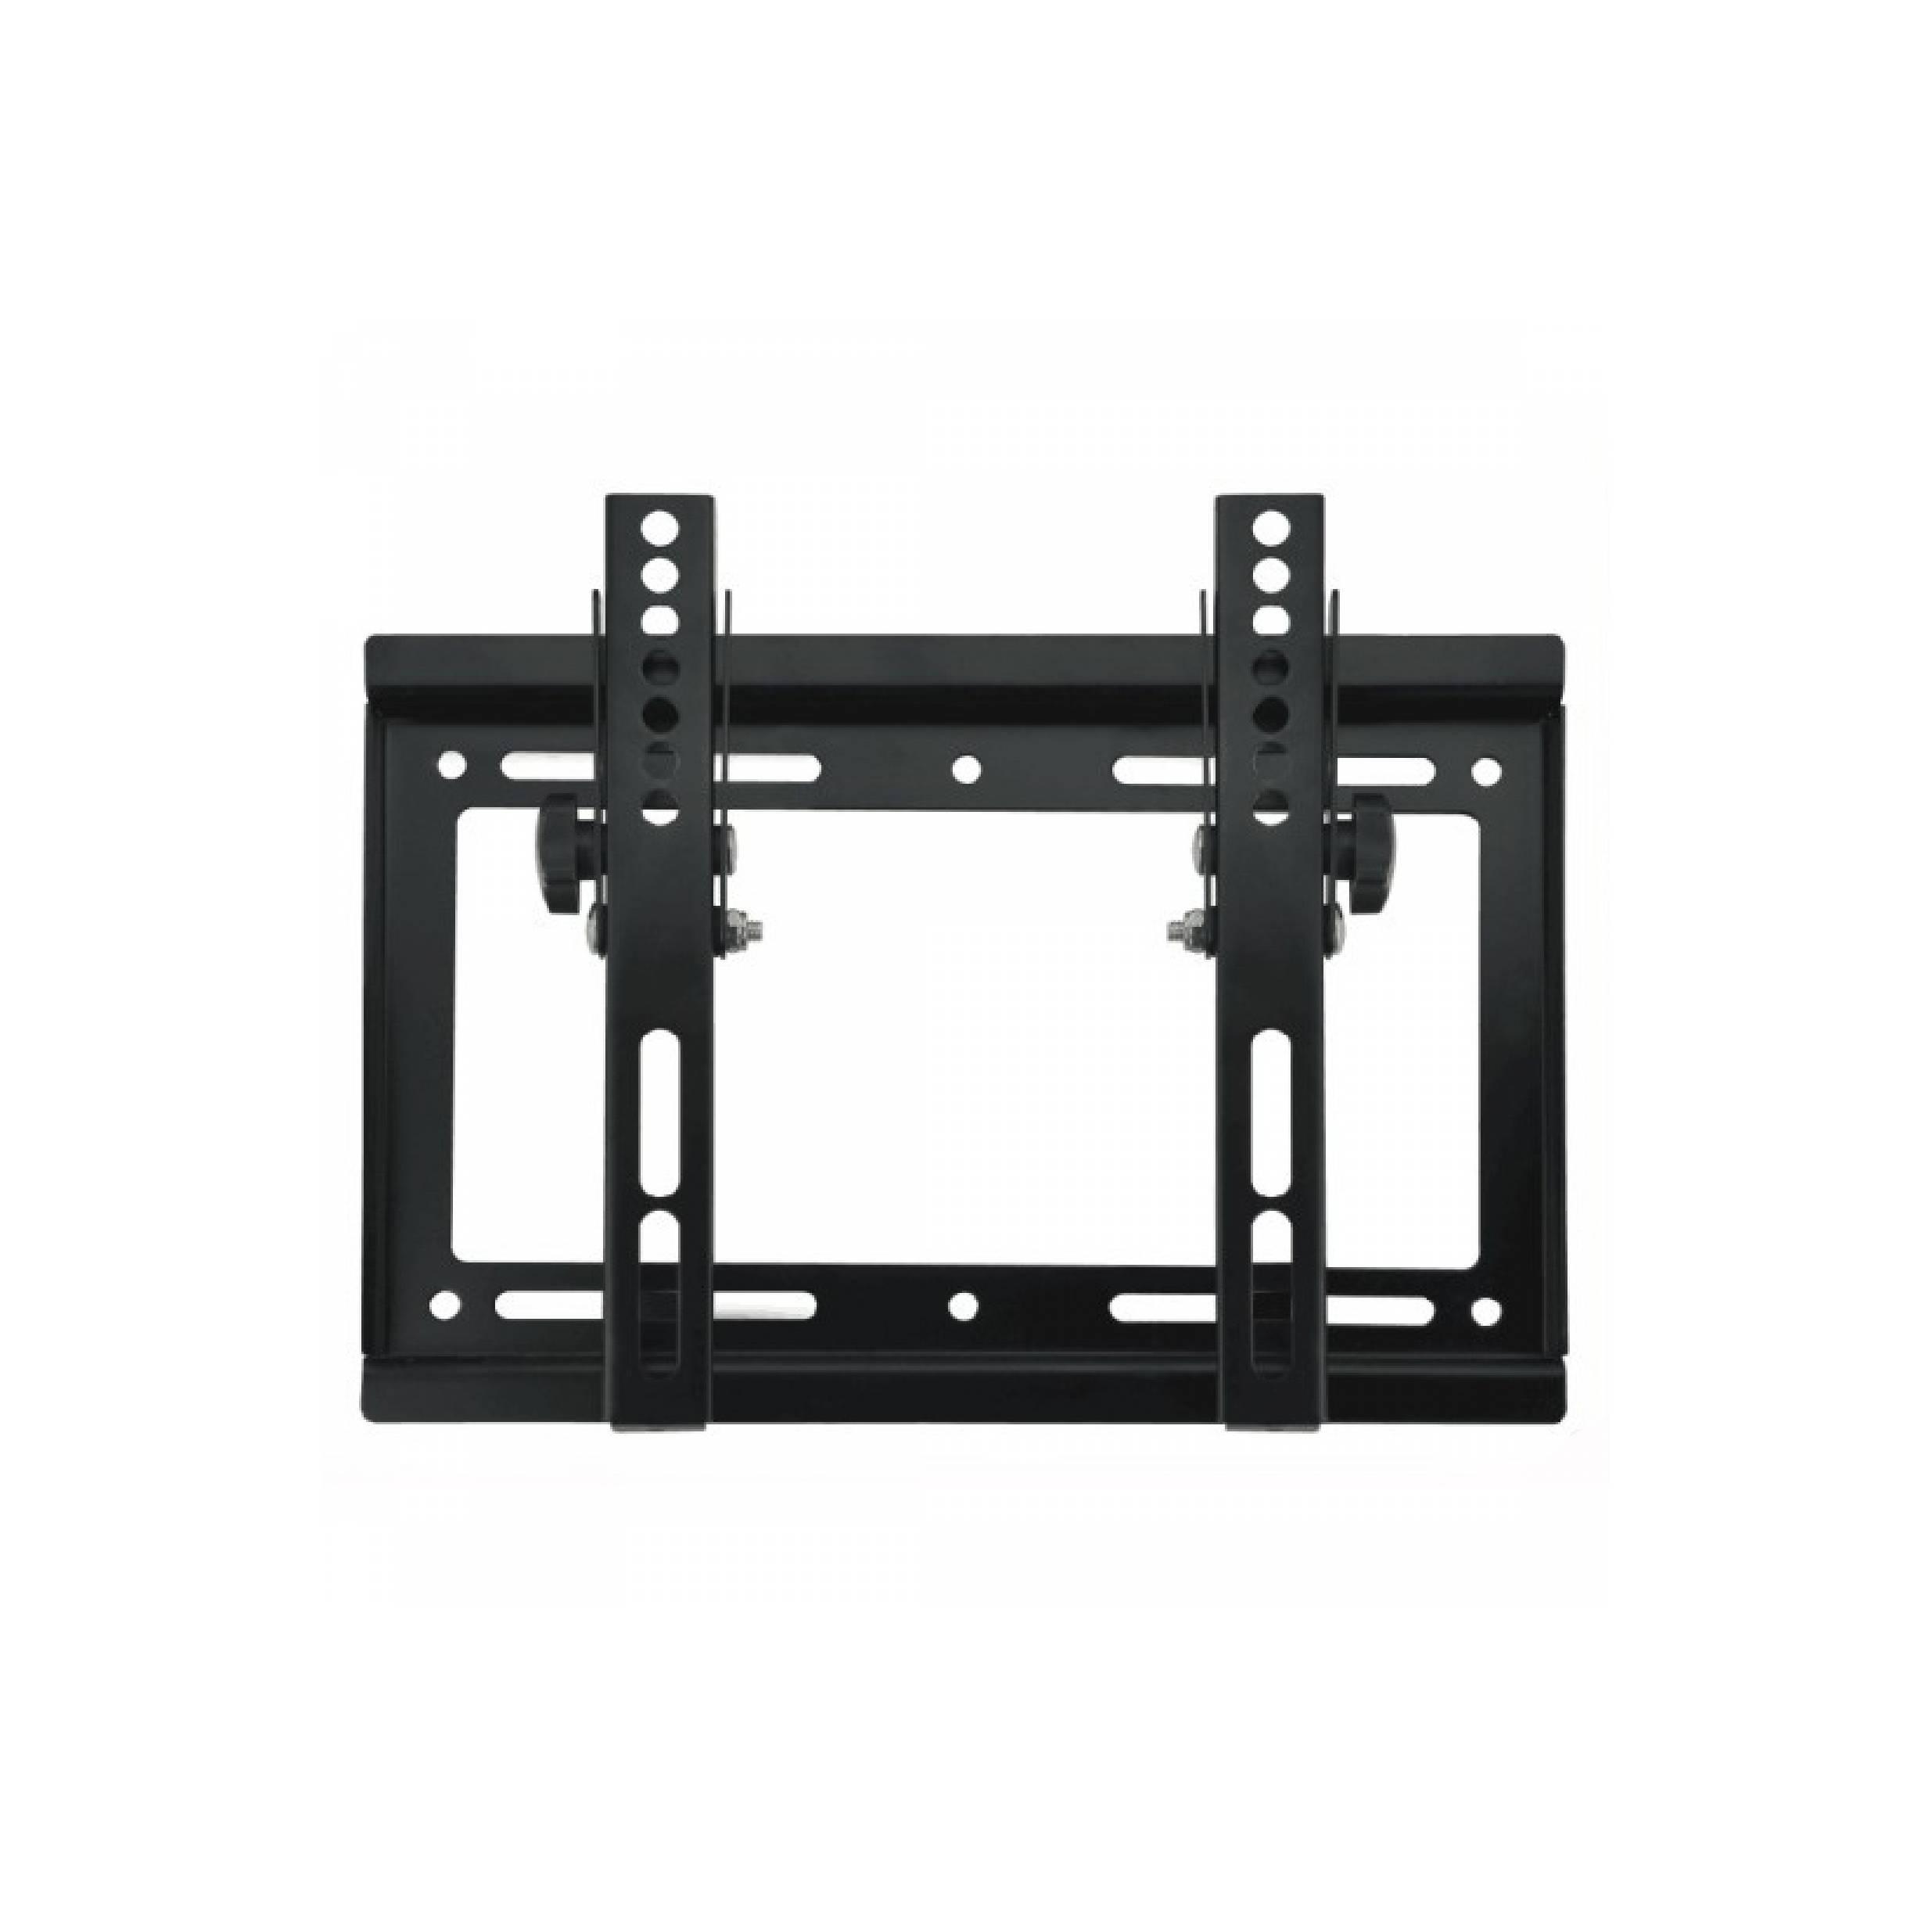 New Braket Plafon Ceiling Lcd Led Tv 42 70 Moto Cp 513 Bracket . Source · Bracket TV LCD LED Adjustble Left And Right 1.3mm Untuk TV 14-42 Inch